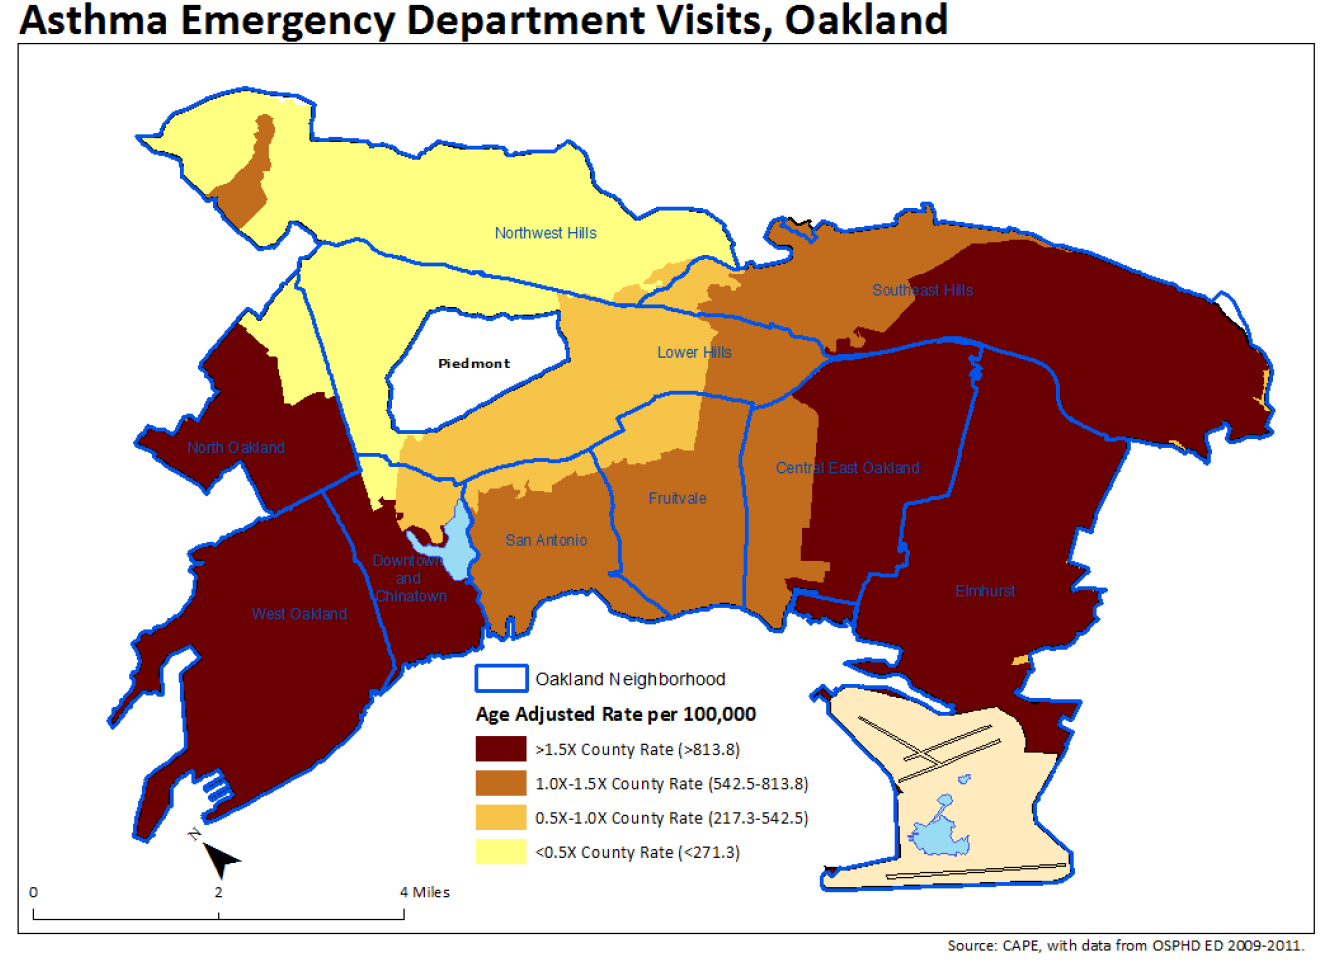 asthma emergency visits